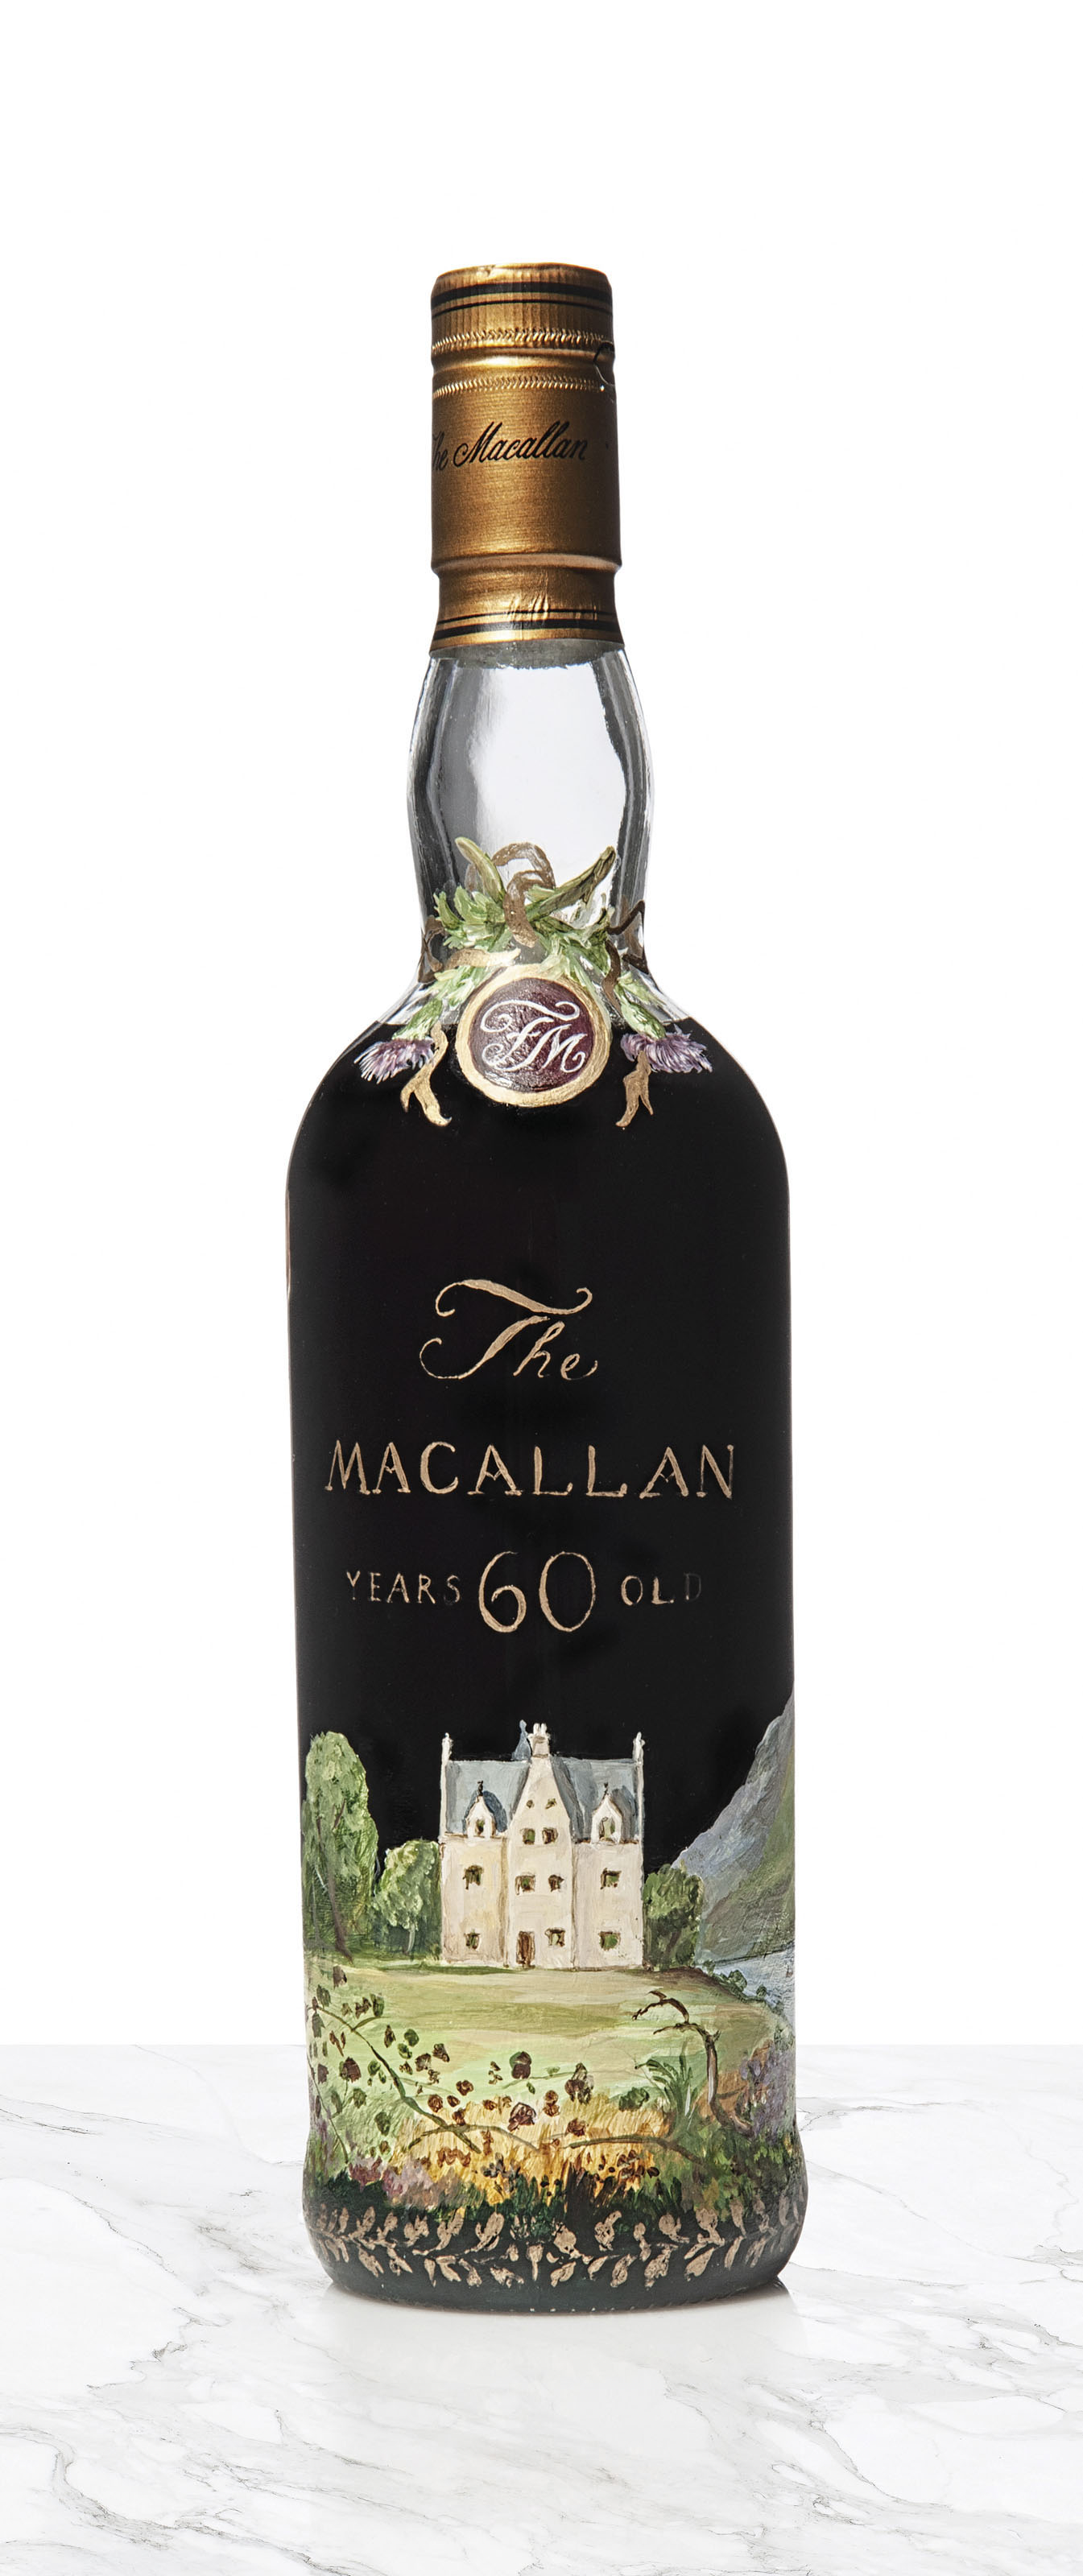 The Macallan 1926, 60 Year-Old, Michael Dillon